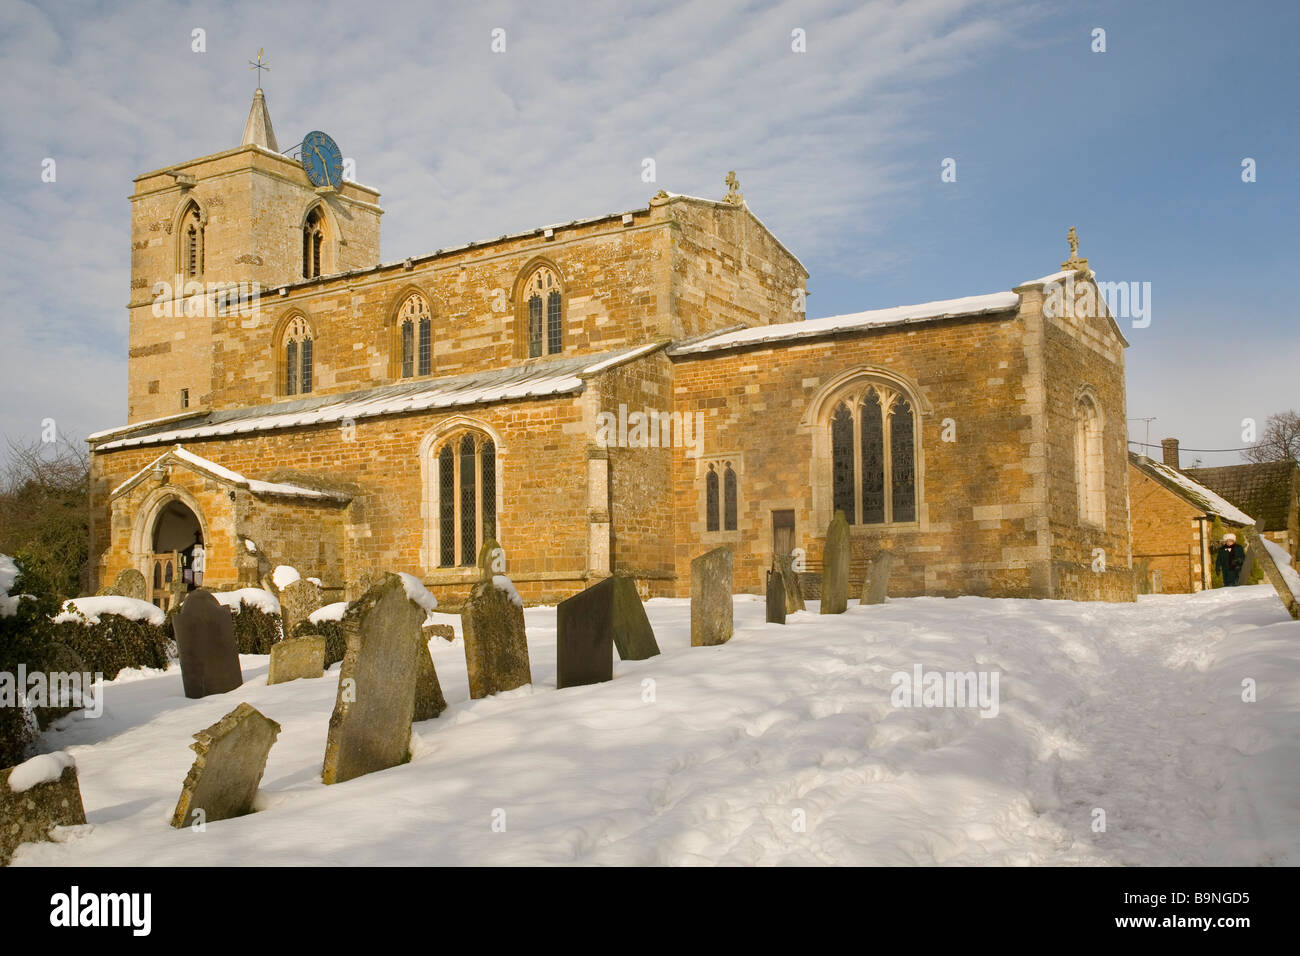 England Rutland Braunston church under snow - Stock Image